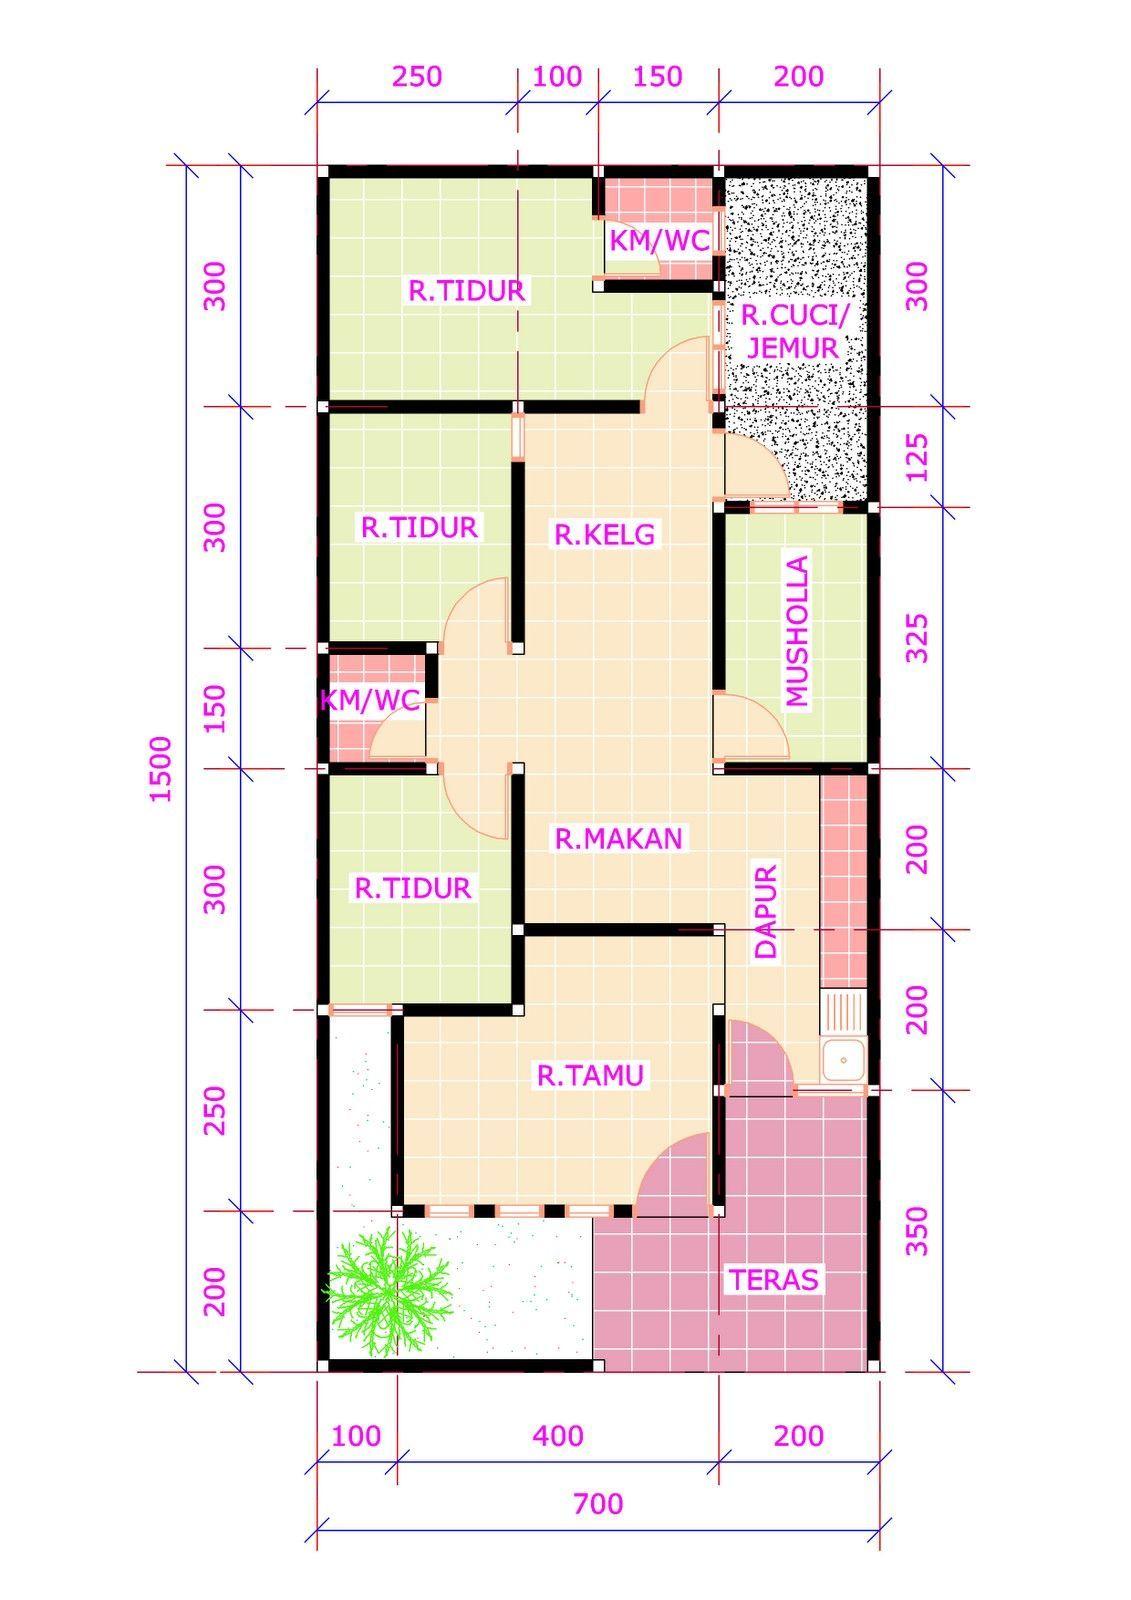 Denah Rumah 3 Kamar Tidur 1 Mushola Minimalis Sederhana Dengan Denah Rumah Desain Rumah House Blueprints